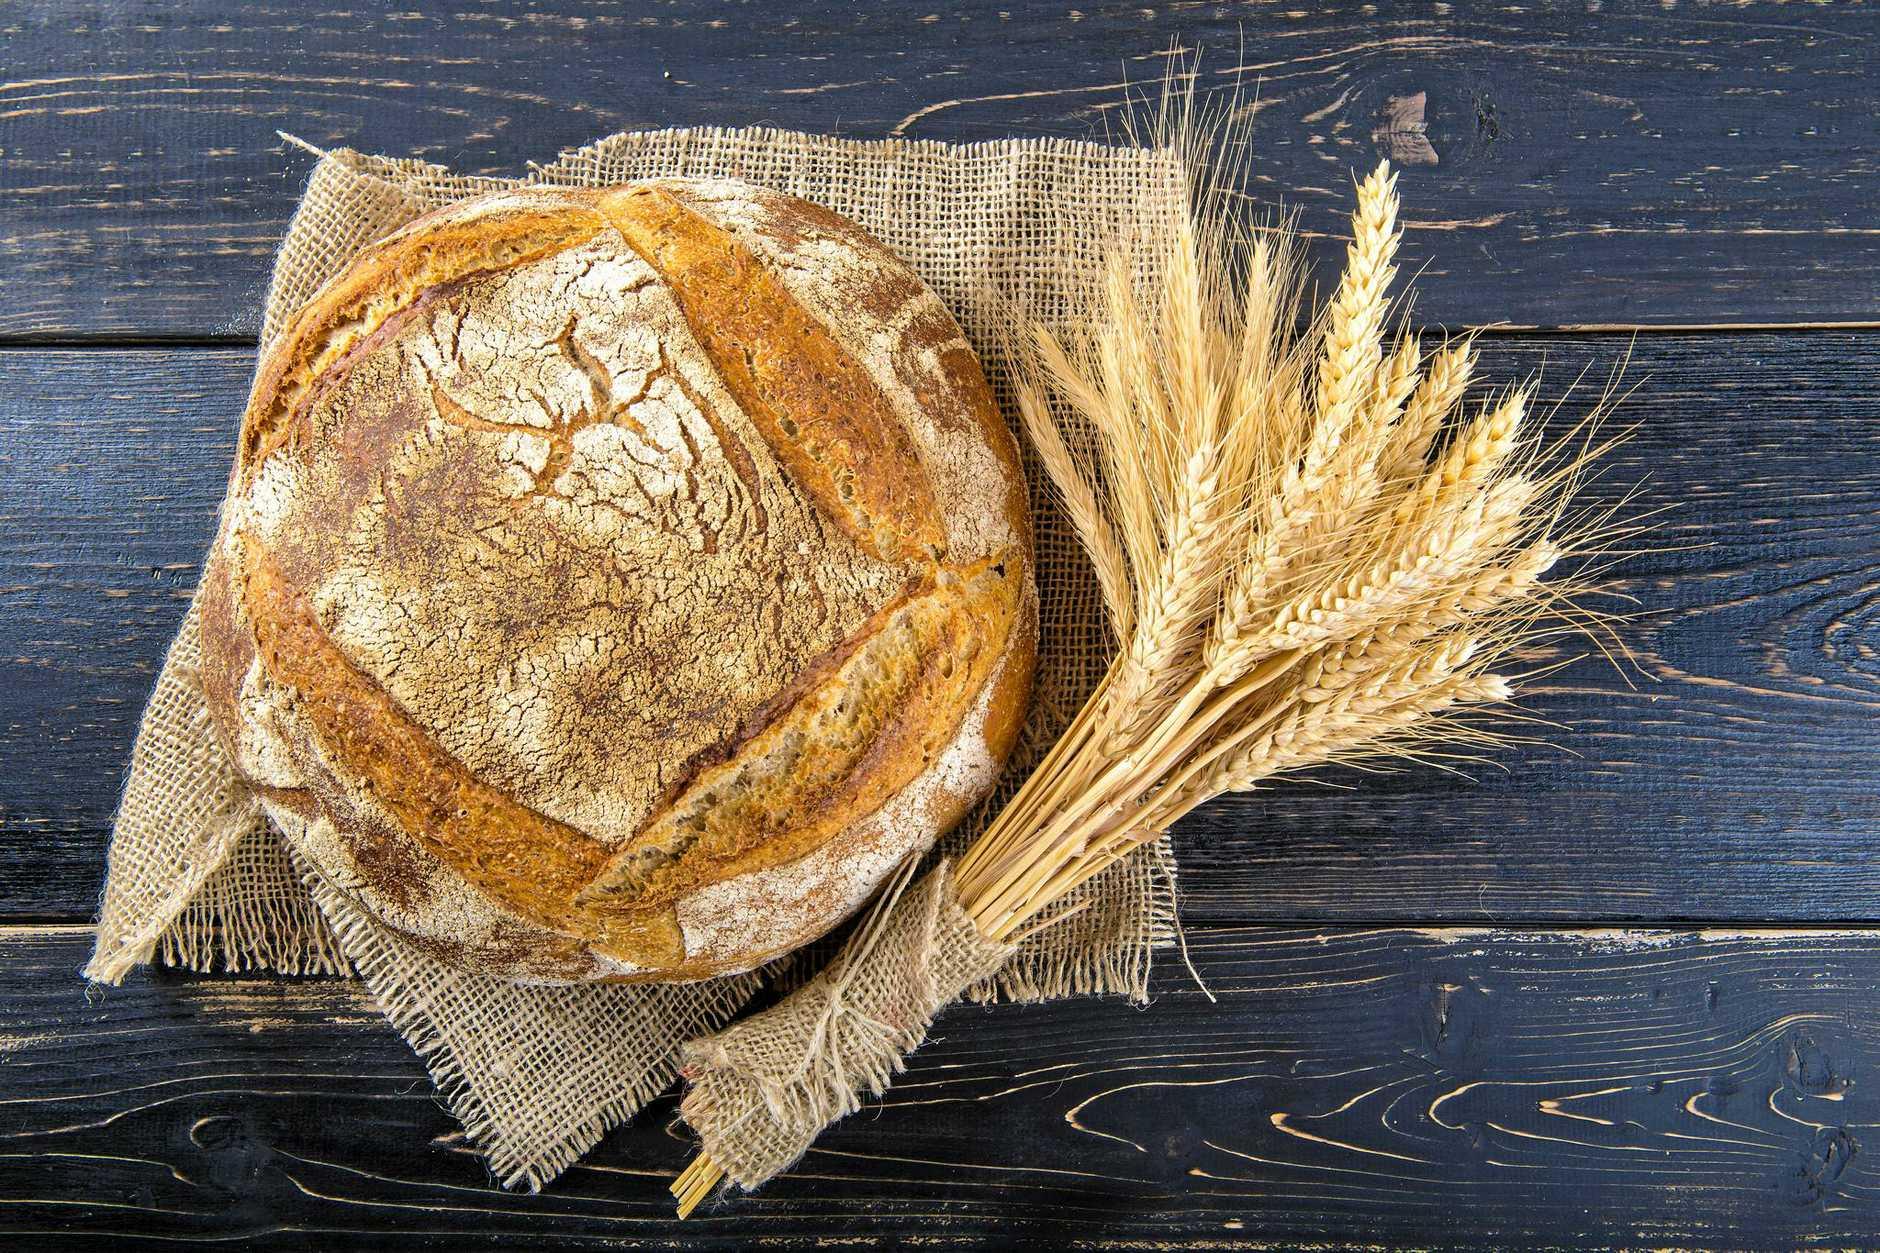 MAKE A CRUST: Elisabeth Fekonia's first workshop covers how to make sourdough bread.